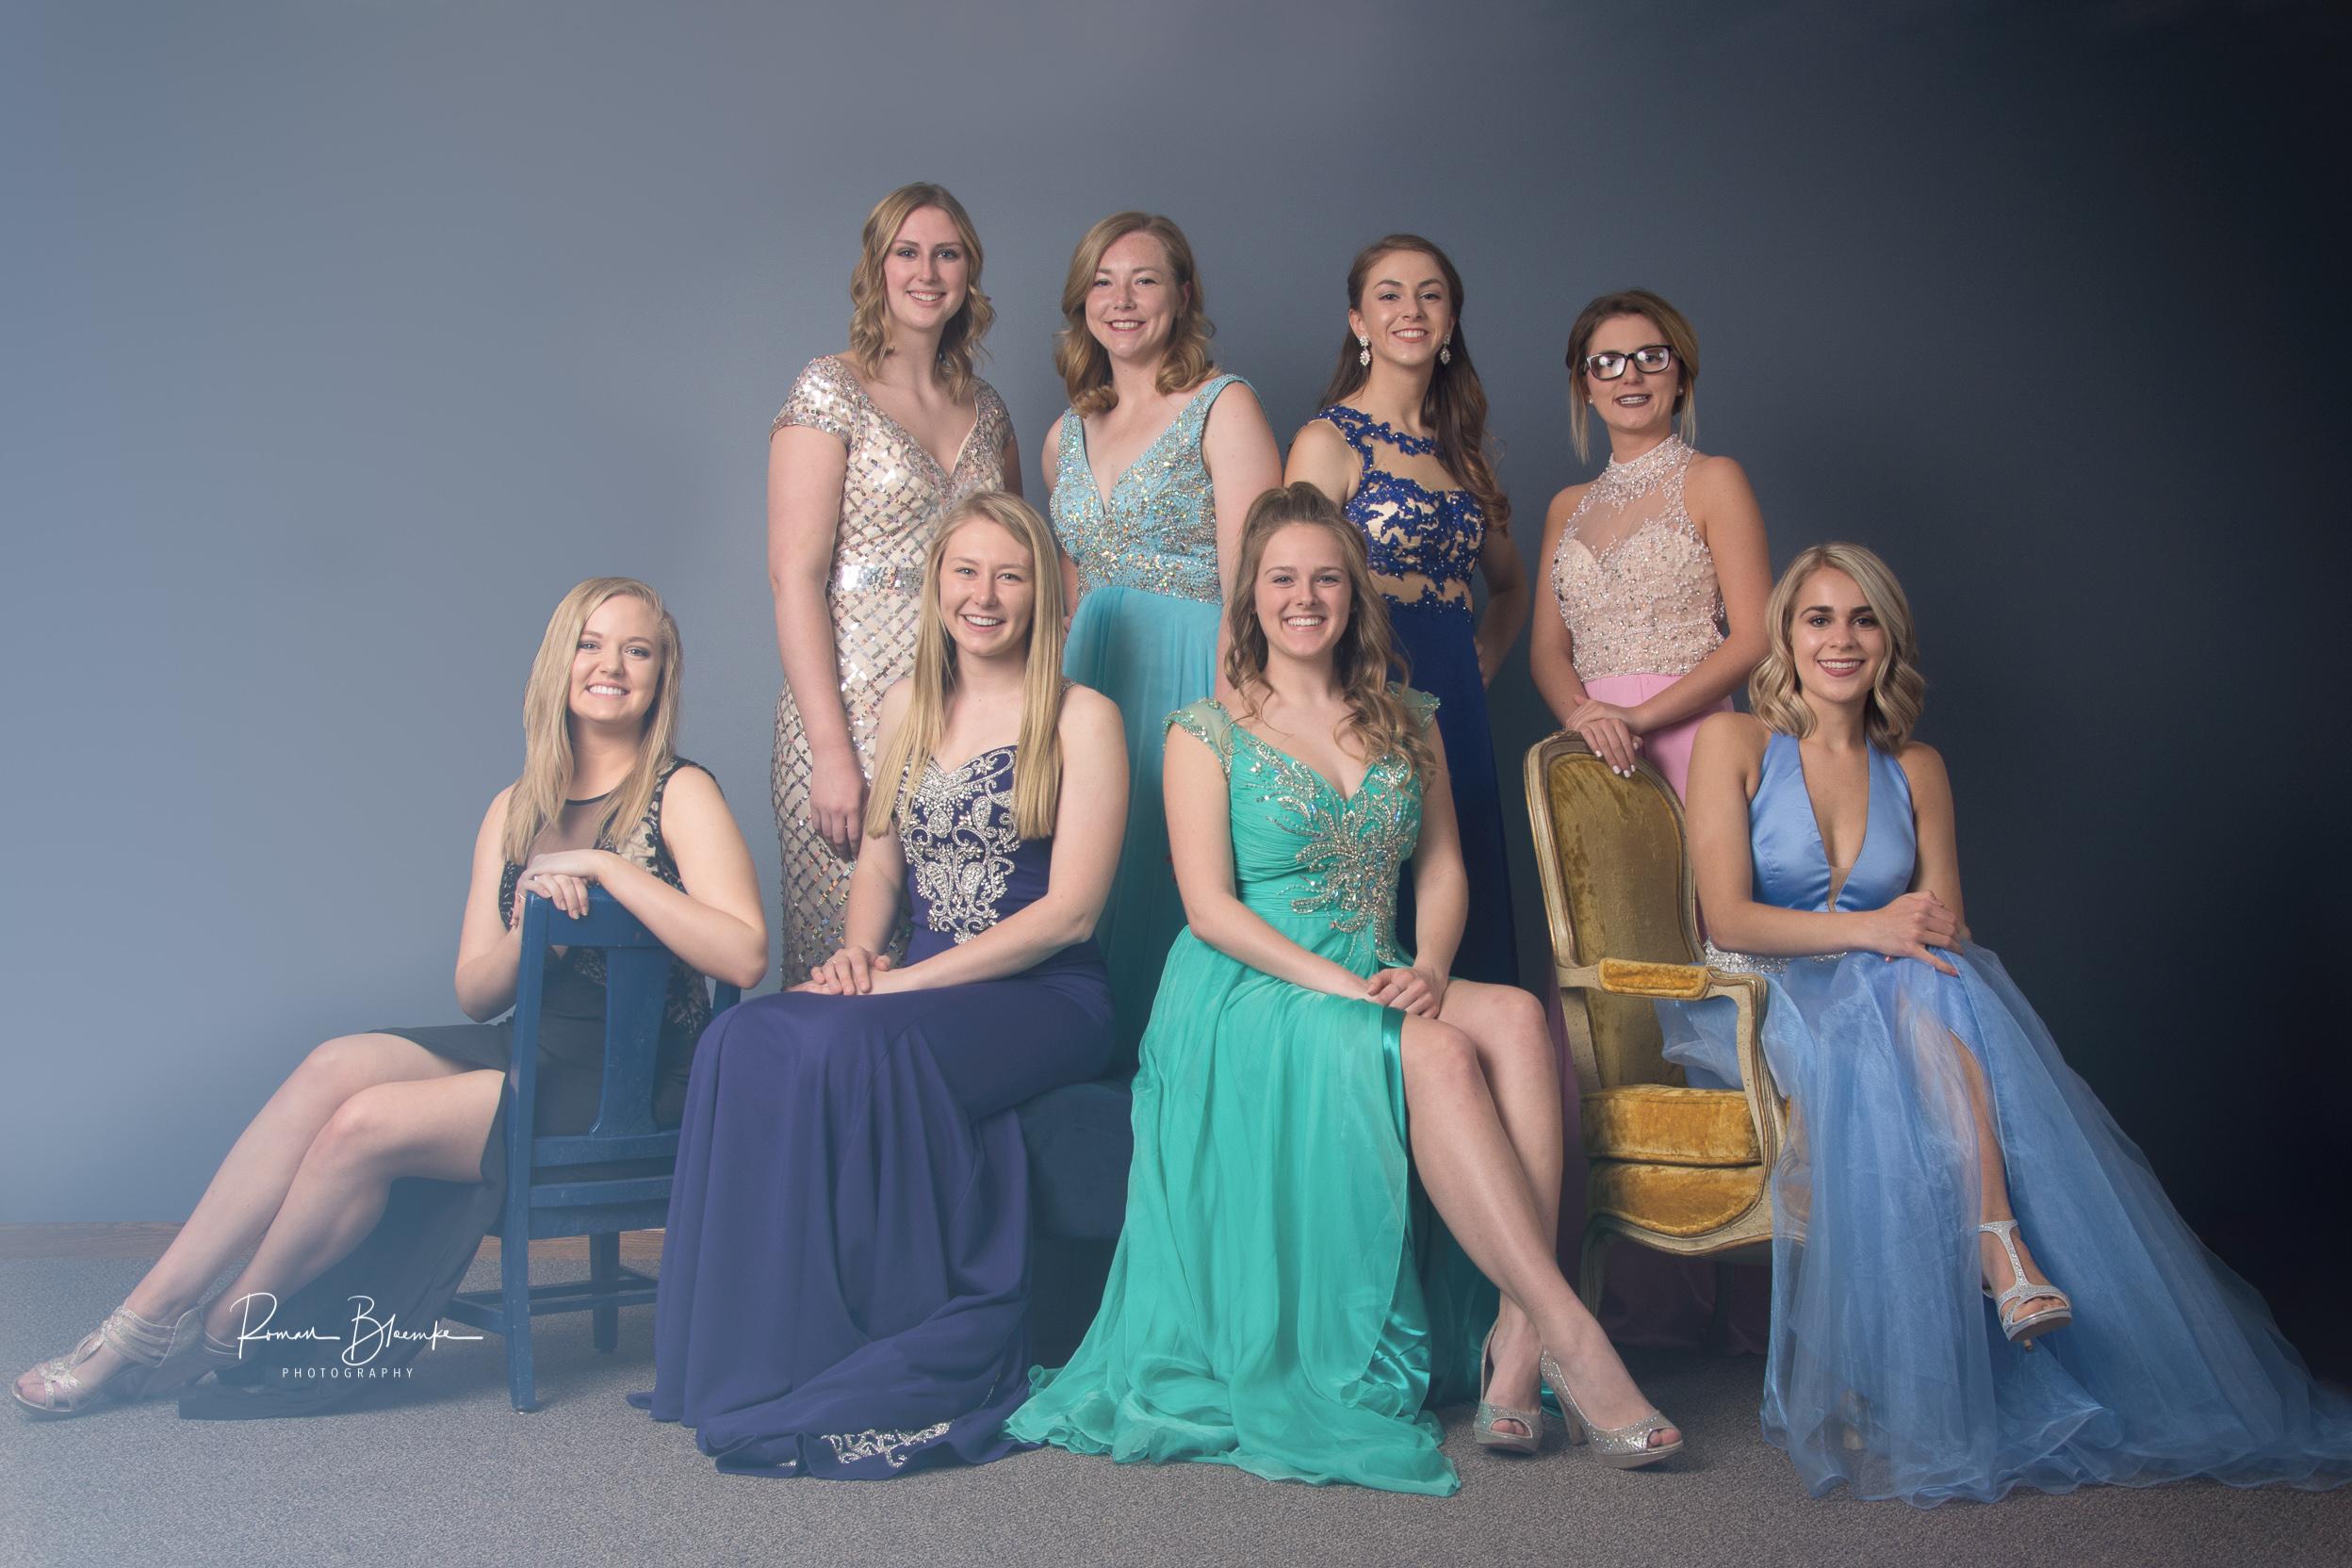 Ashley, Taylor, Erin, Olivia, Ann, Mandy, Taylor, and Alison.